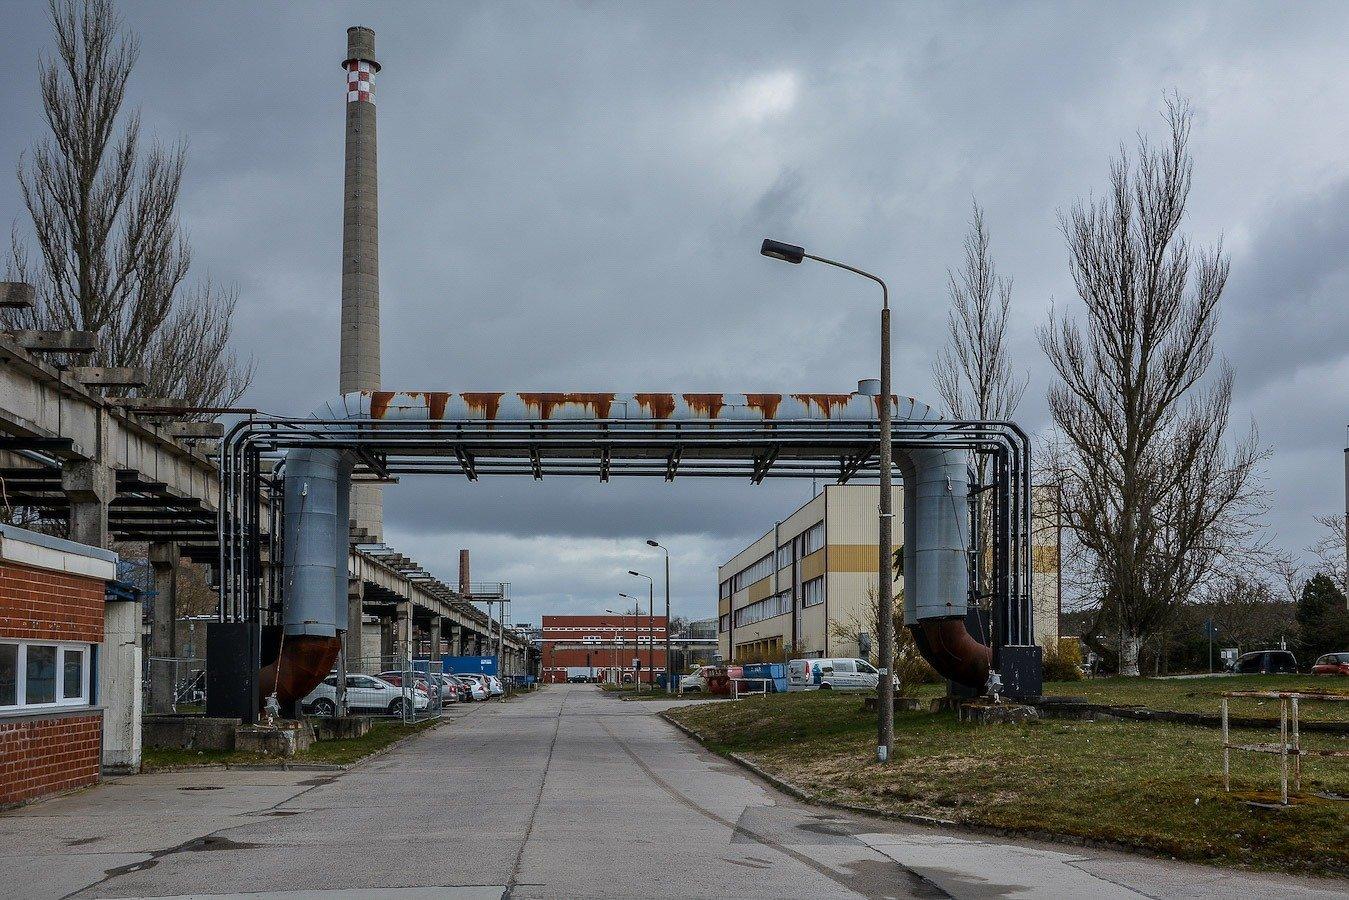 steam tube rohr kernkraftwerk greifswald nuclear powerplant ost deutschland east germany gdr DDR mecklenburg vorpommern